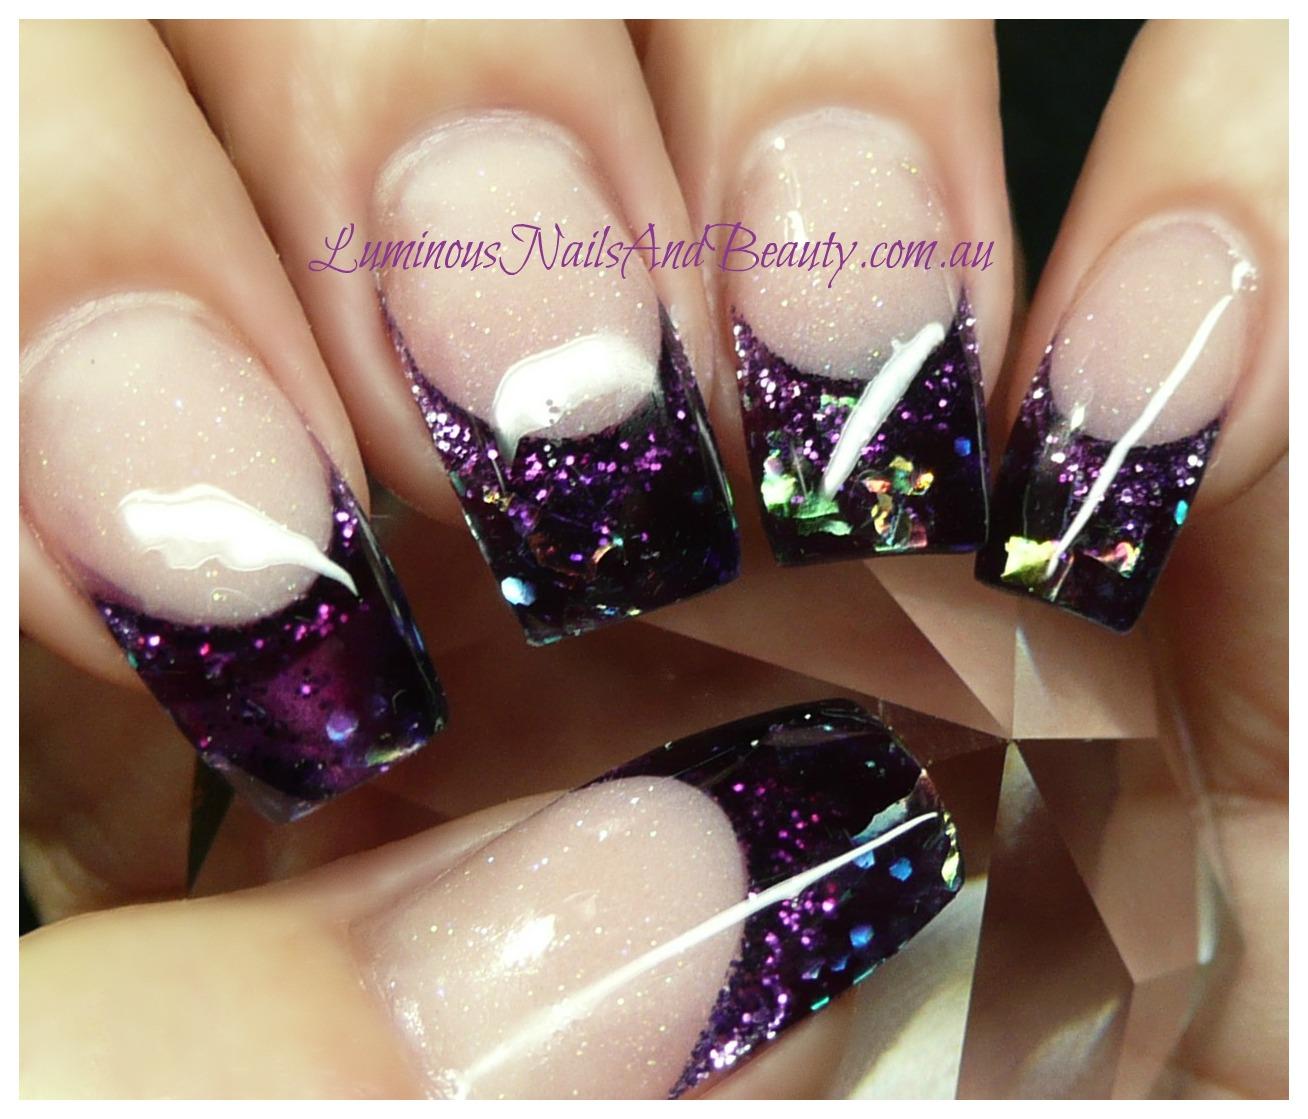 Luminous nails nail design and nails on pinterest for Acrylic nails salon brisbane